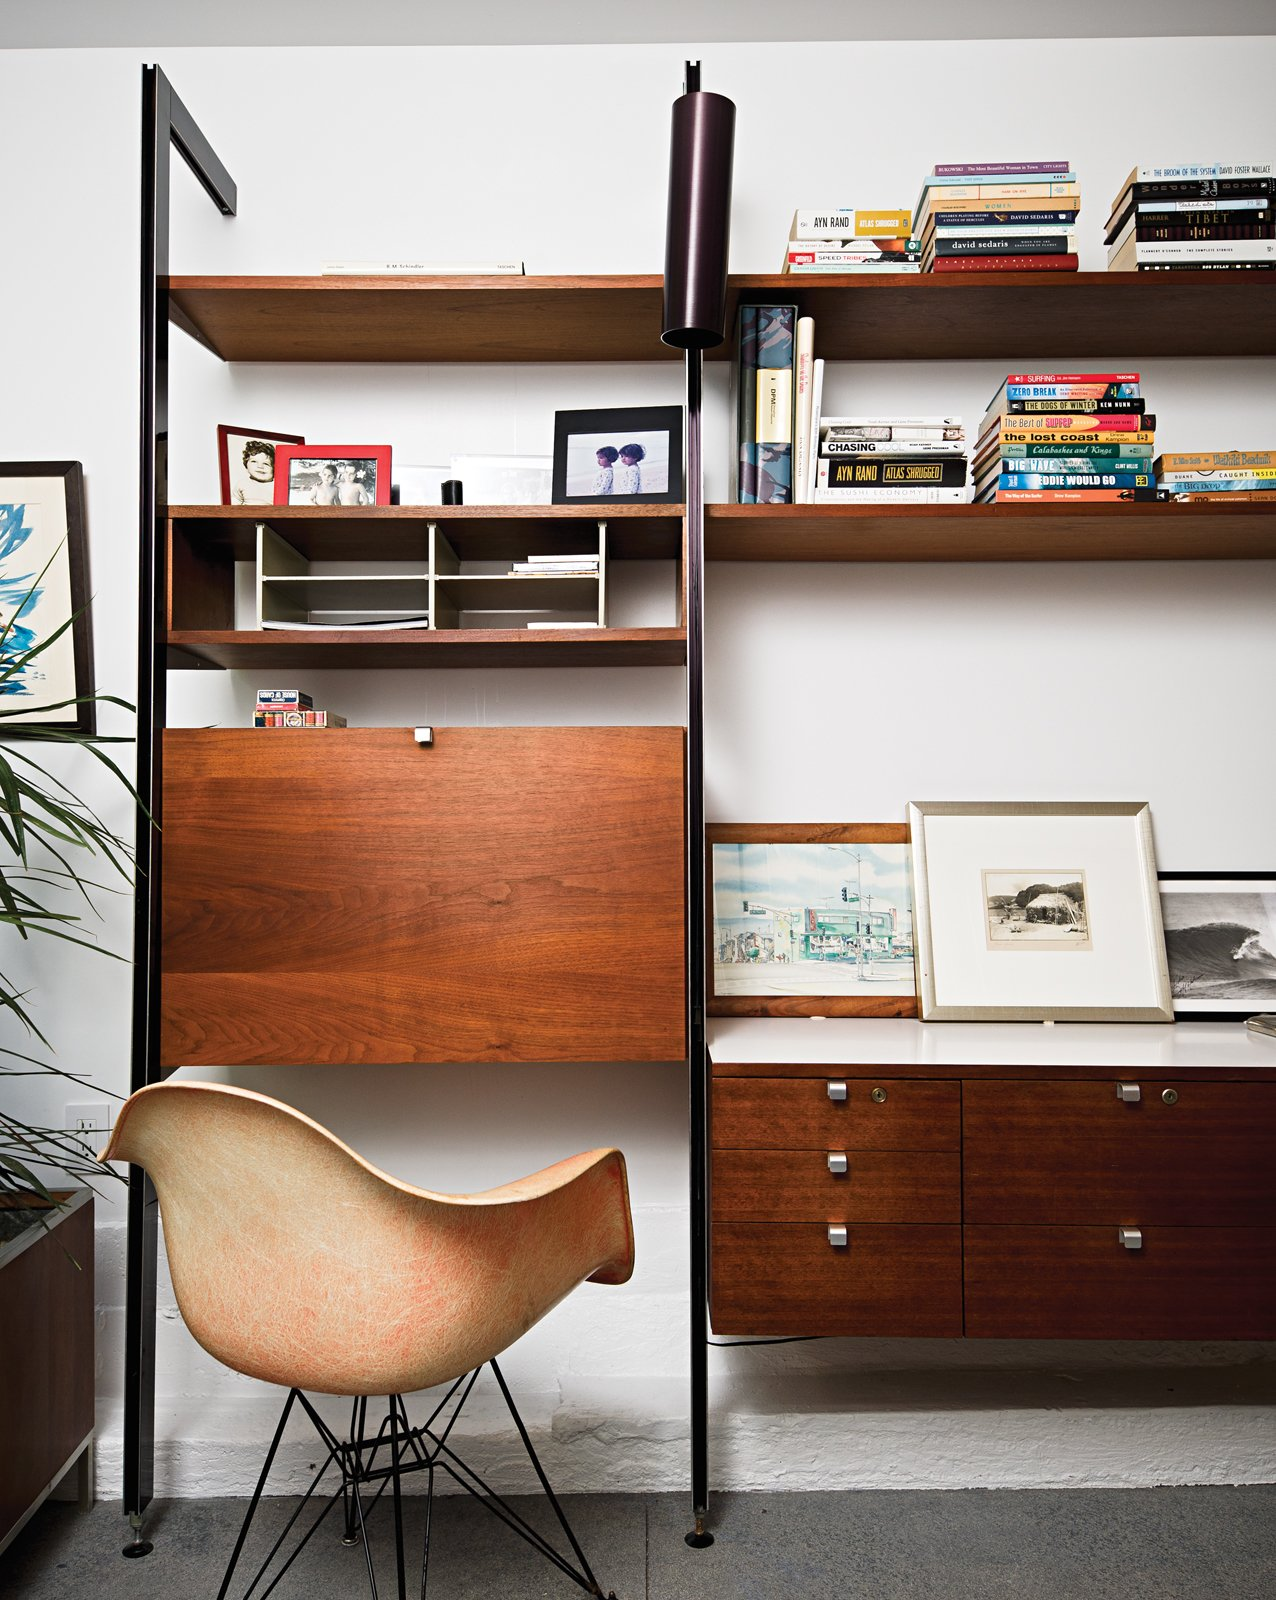 #seatingdesign #chair #Eames #shellchair #Gardena #California #MichaelLeeArchitects #midcenturymodern #desk #office #workplace #interior #inside  100+ Best Modern Seating Designs by Dwell